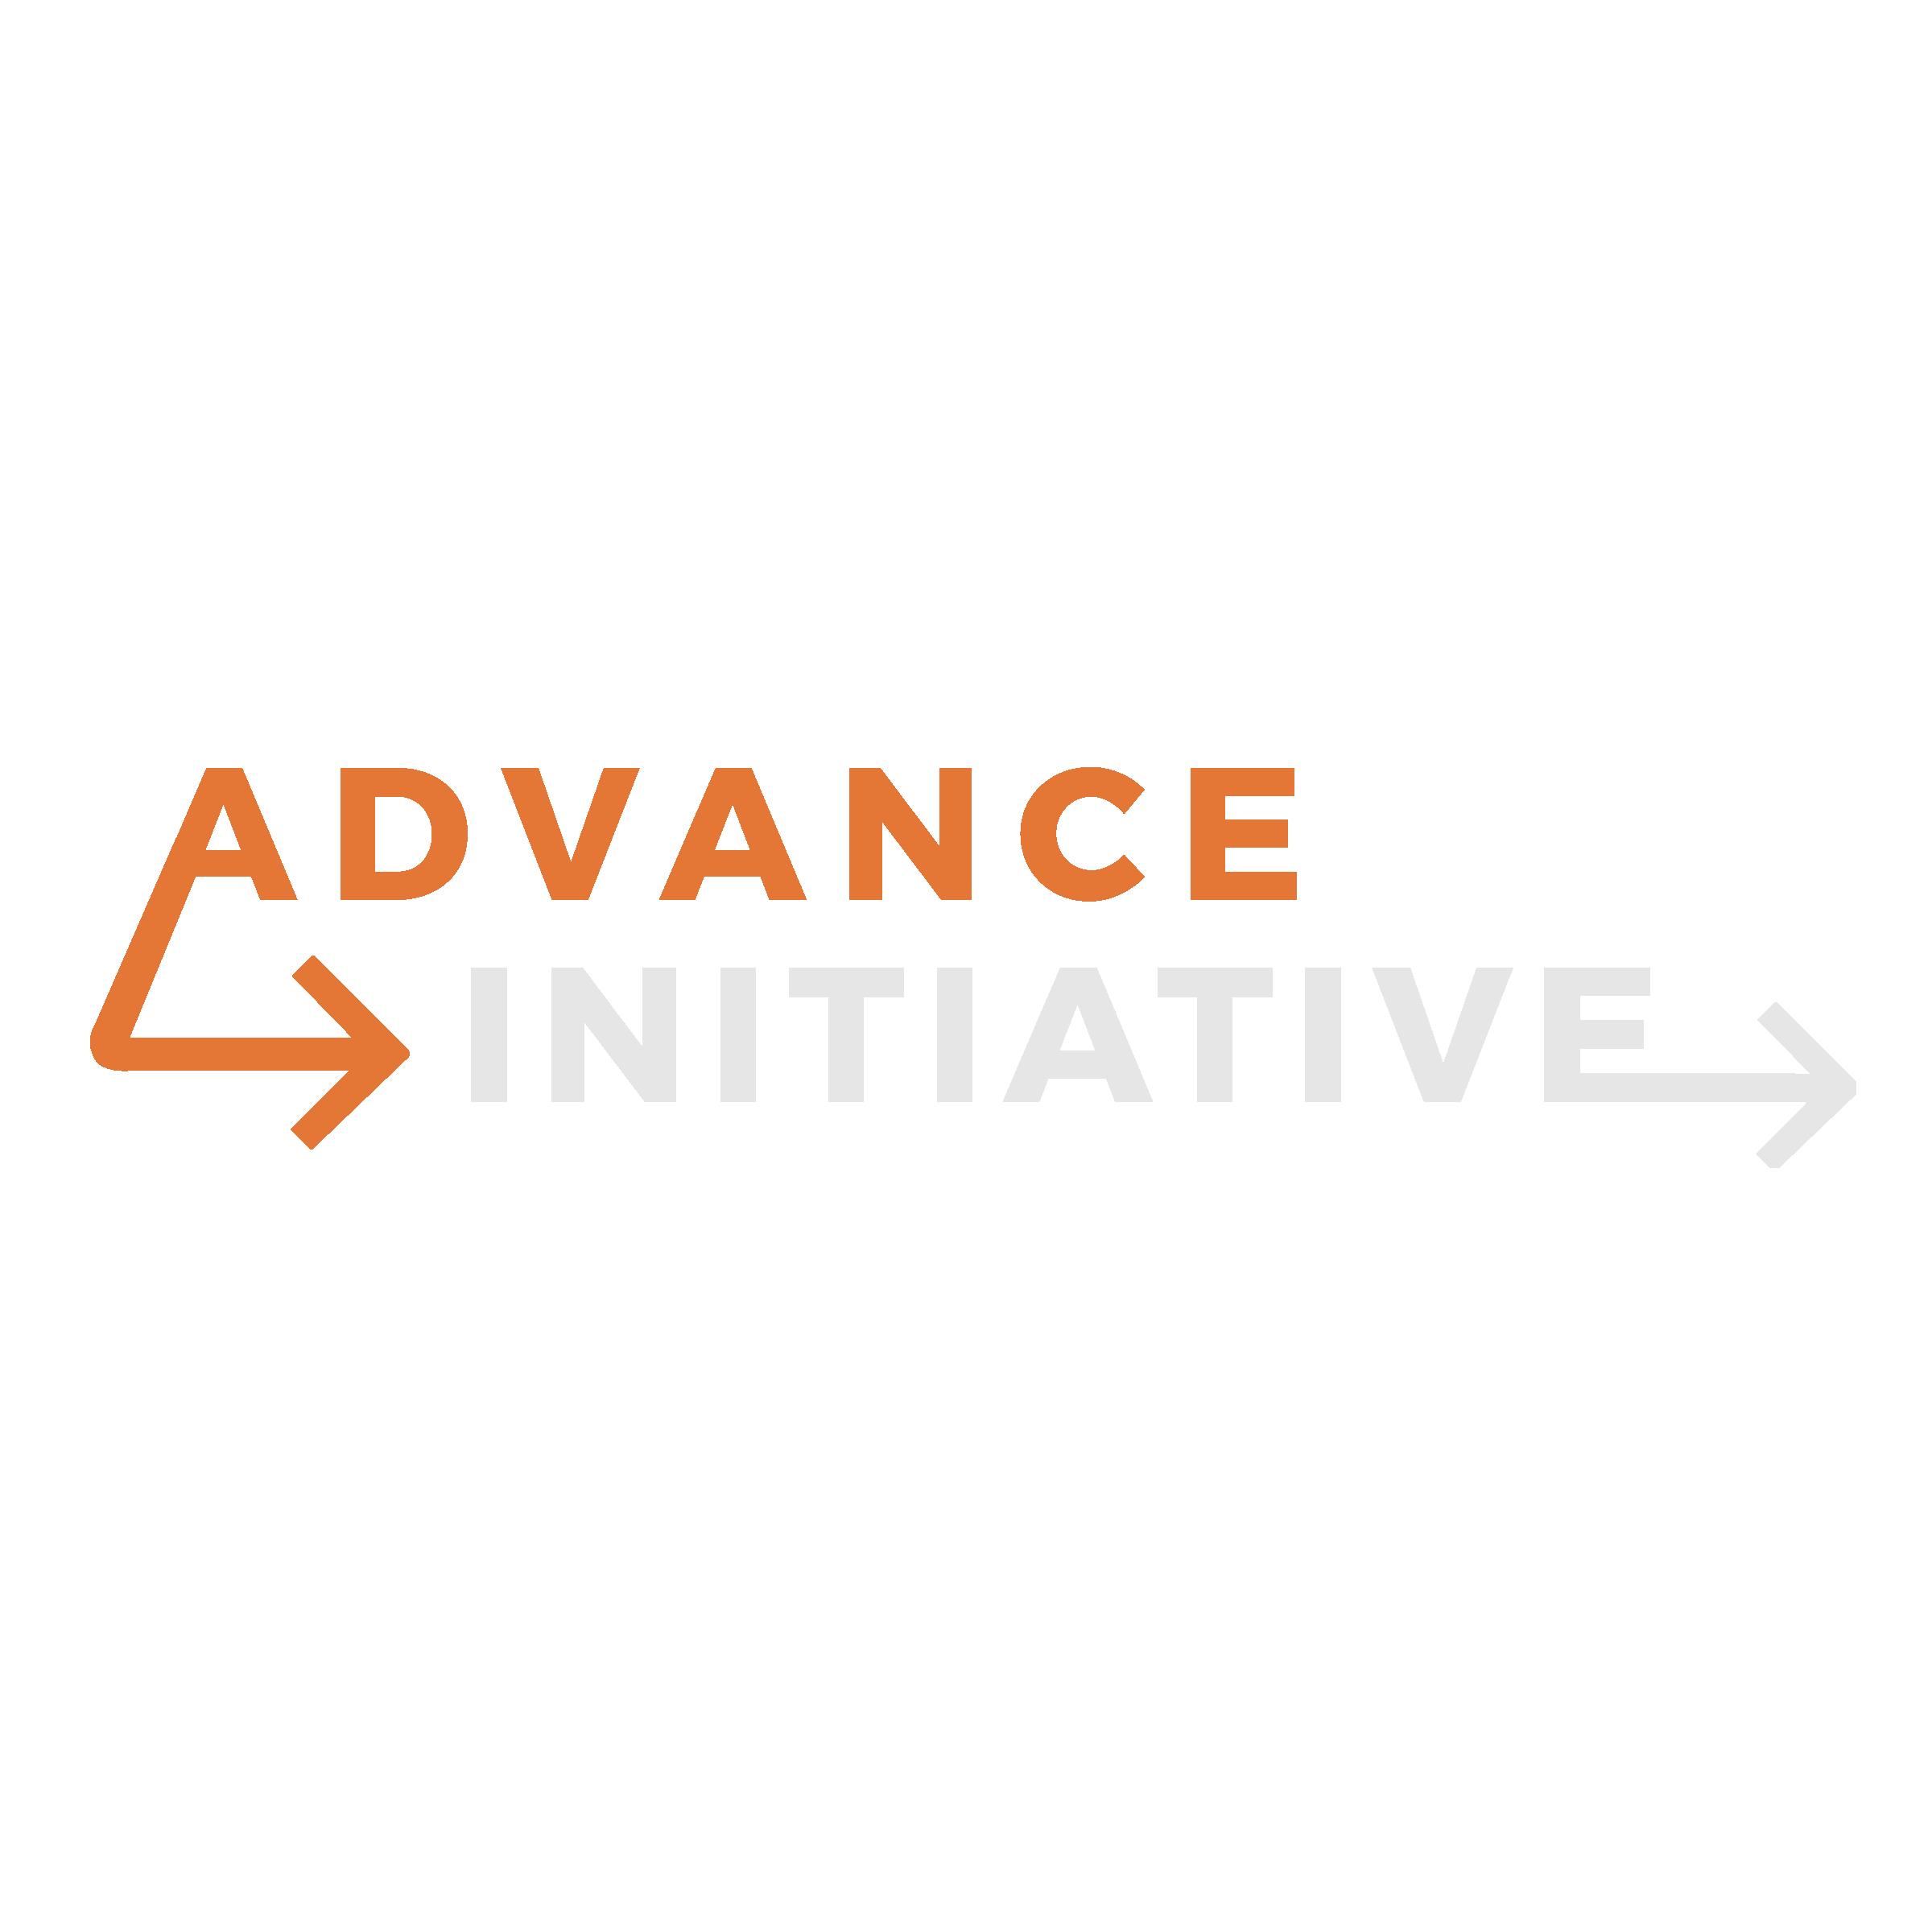 Advance Initiative_web.png